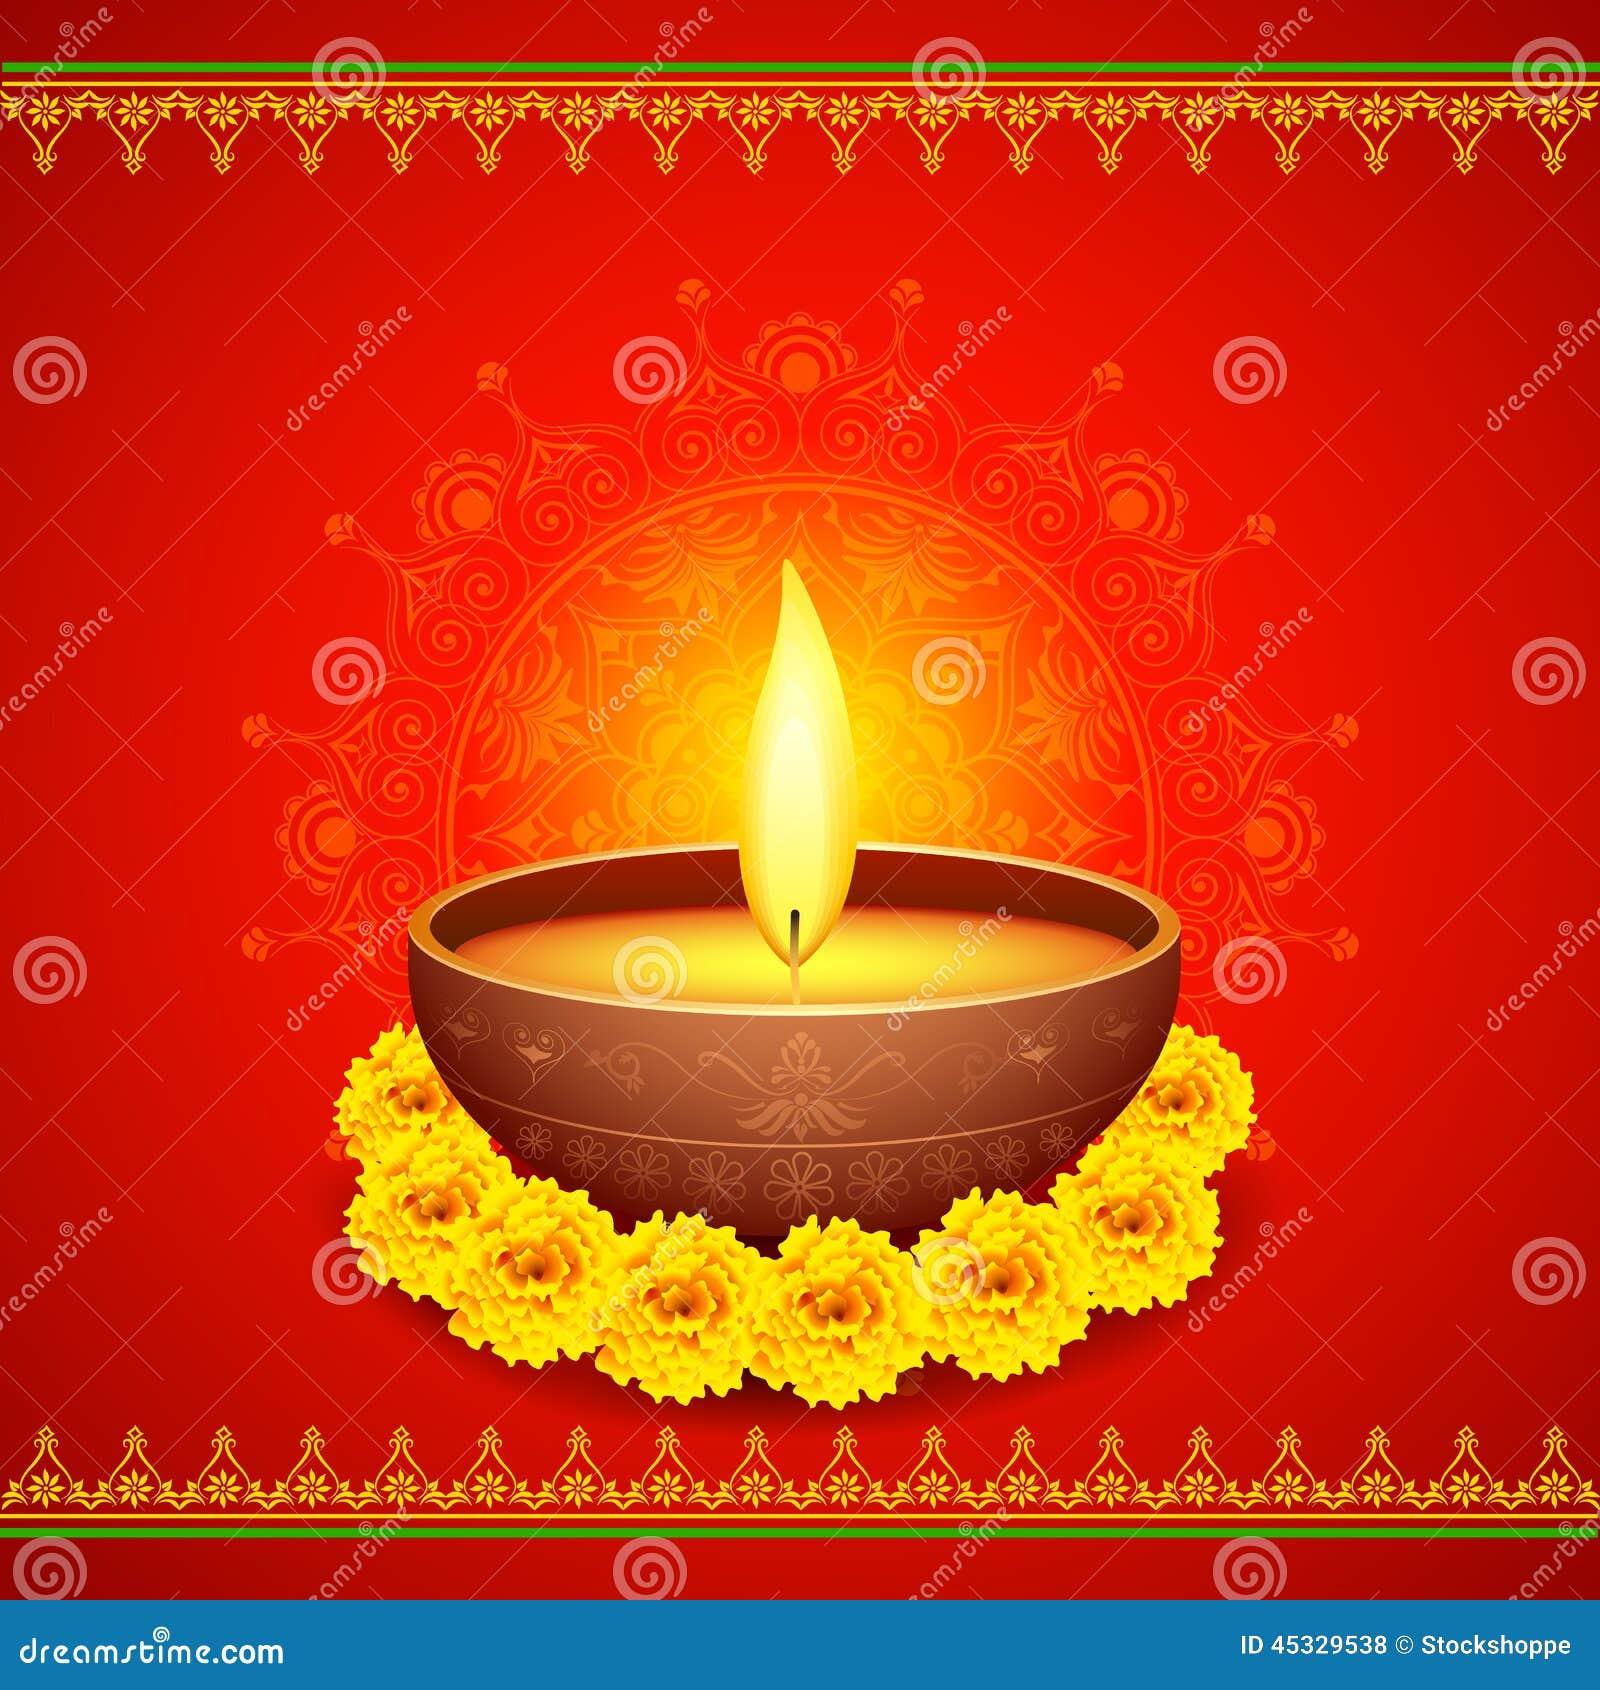 Happy Diwali Diya stock vector. Illustration of deepavali - 45329538 for diwali single diya wallpaper  103wja